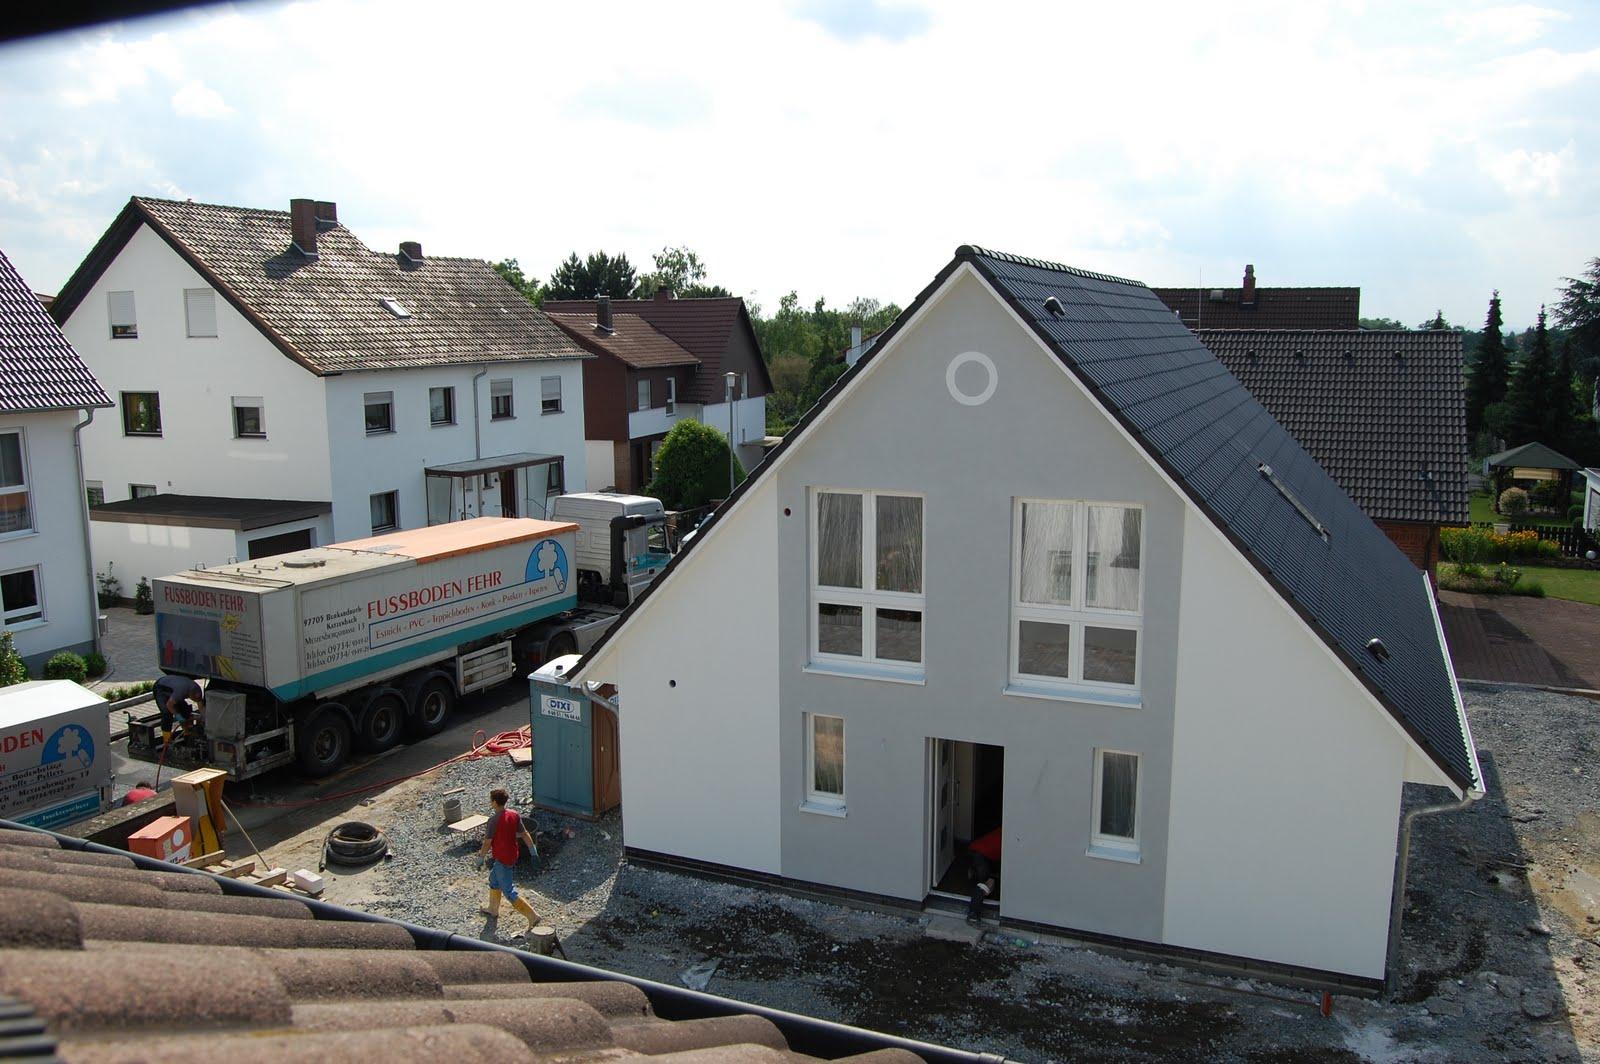 project eigenheim 2010 estrich bauherren m ssen drau en. Black Bedroom Furniture Sets. Home Design Ideas